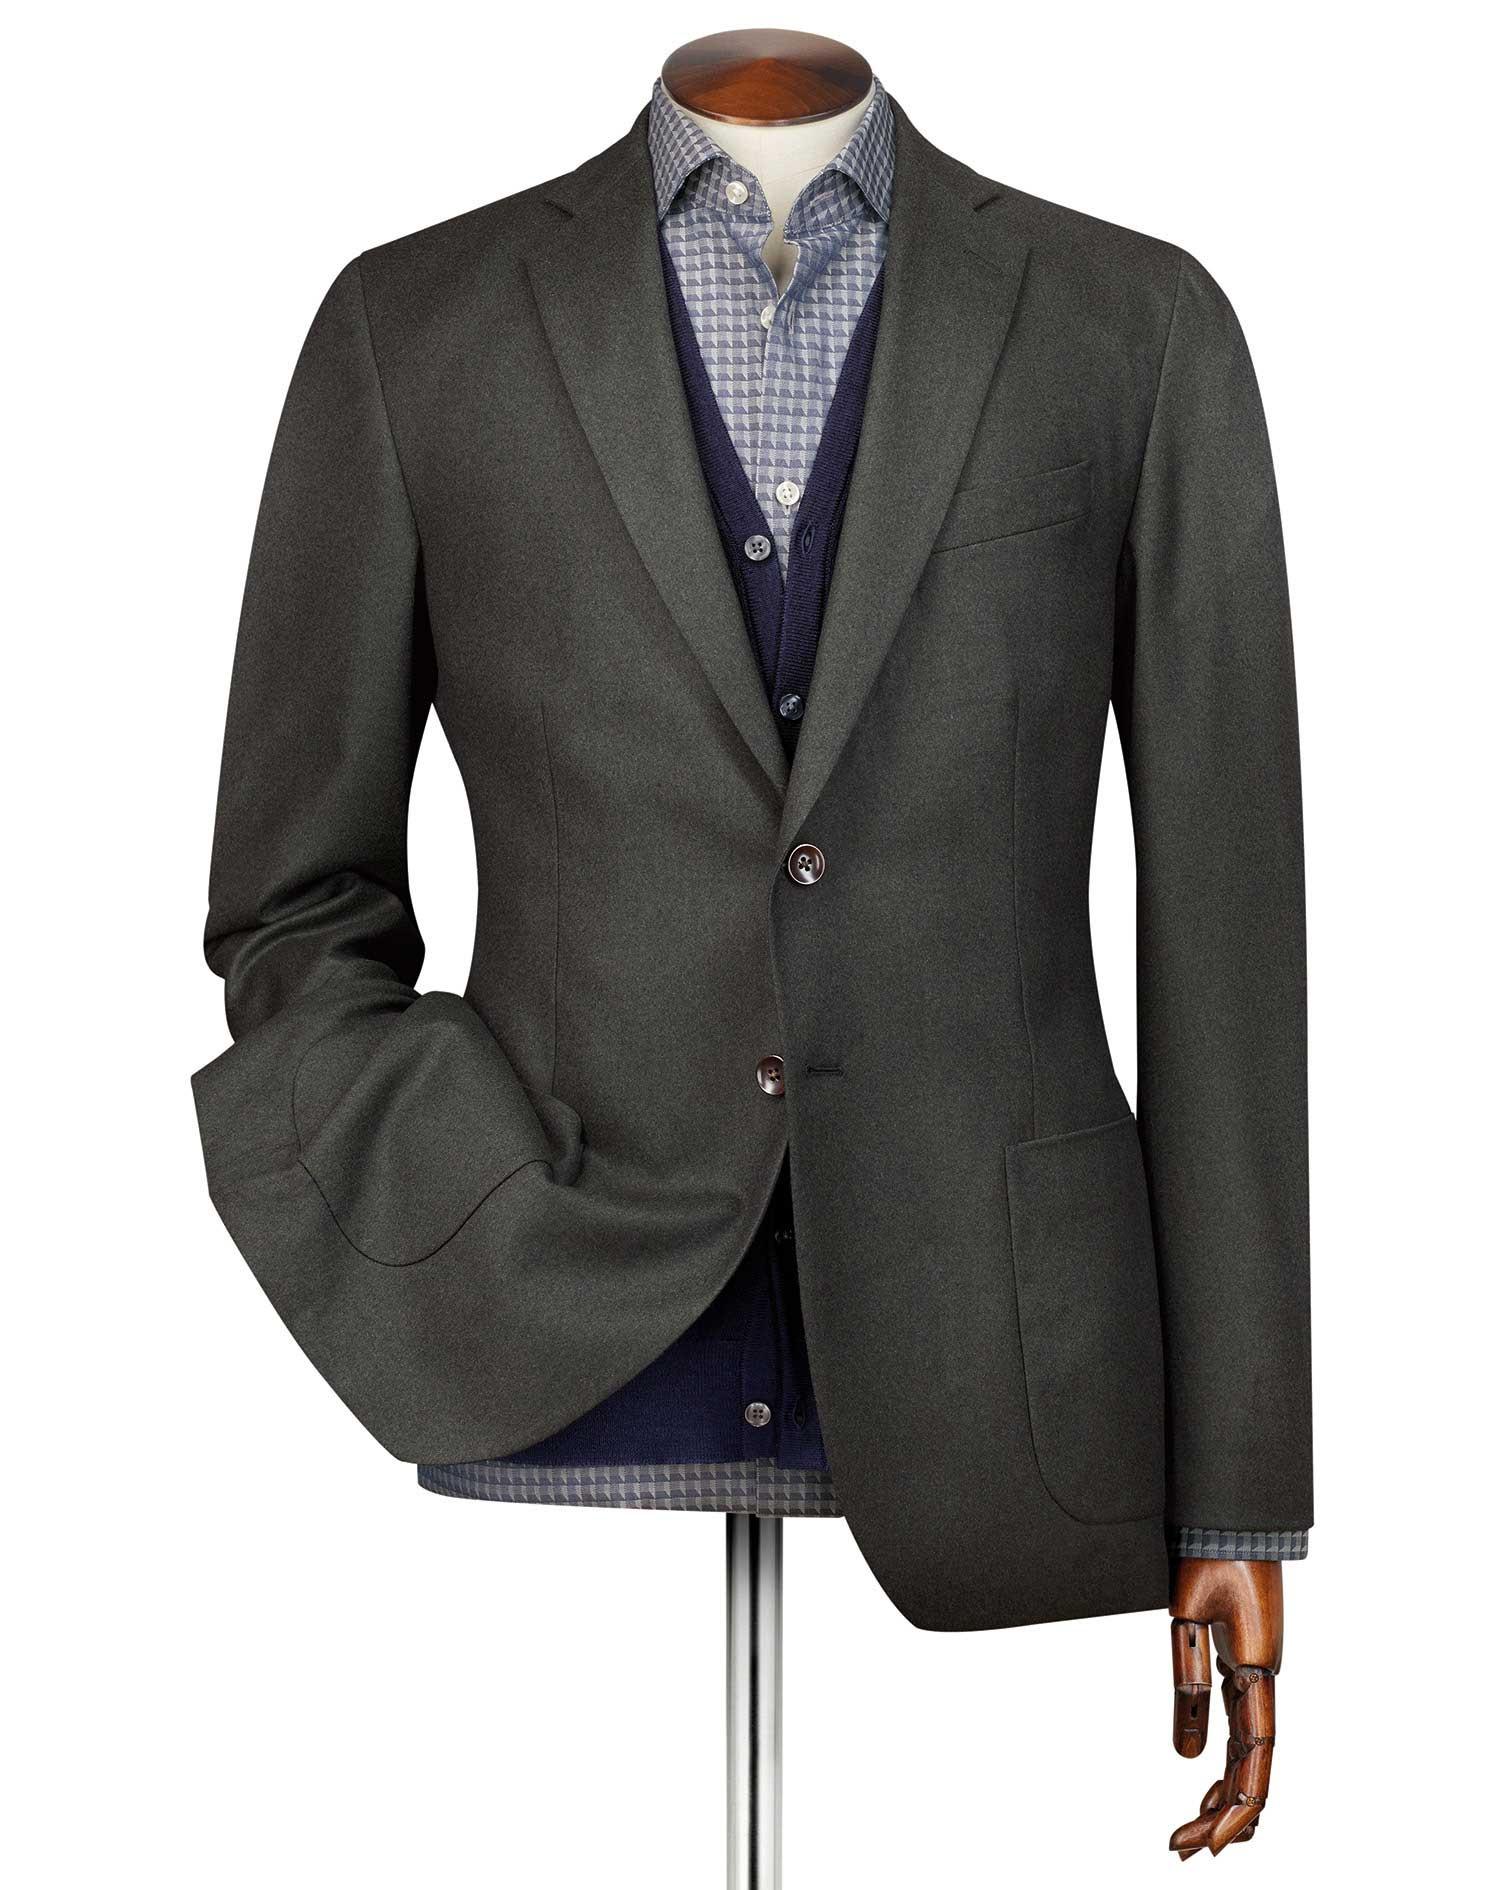 Slim Fit Green Plain Italian Wool Flannel Jacket Size 44 Regular by Charles Tyrwhitt